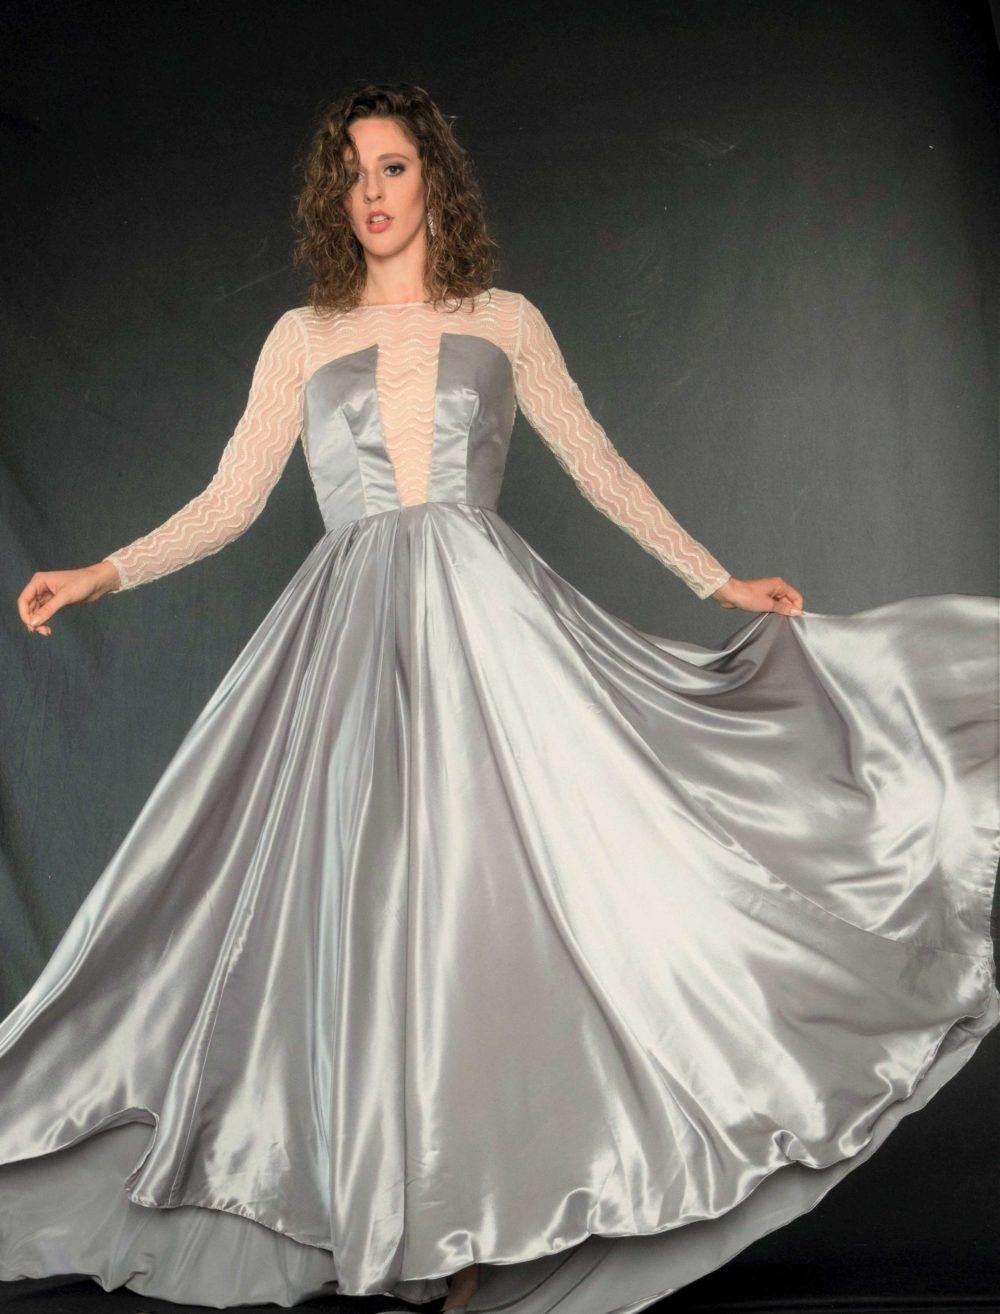 Buy Designer Silver Andromeda Ball Gown For Women Online - Kahini ...